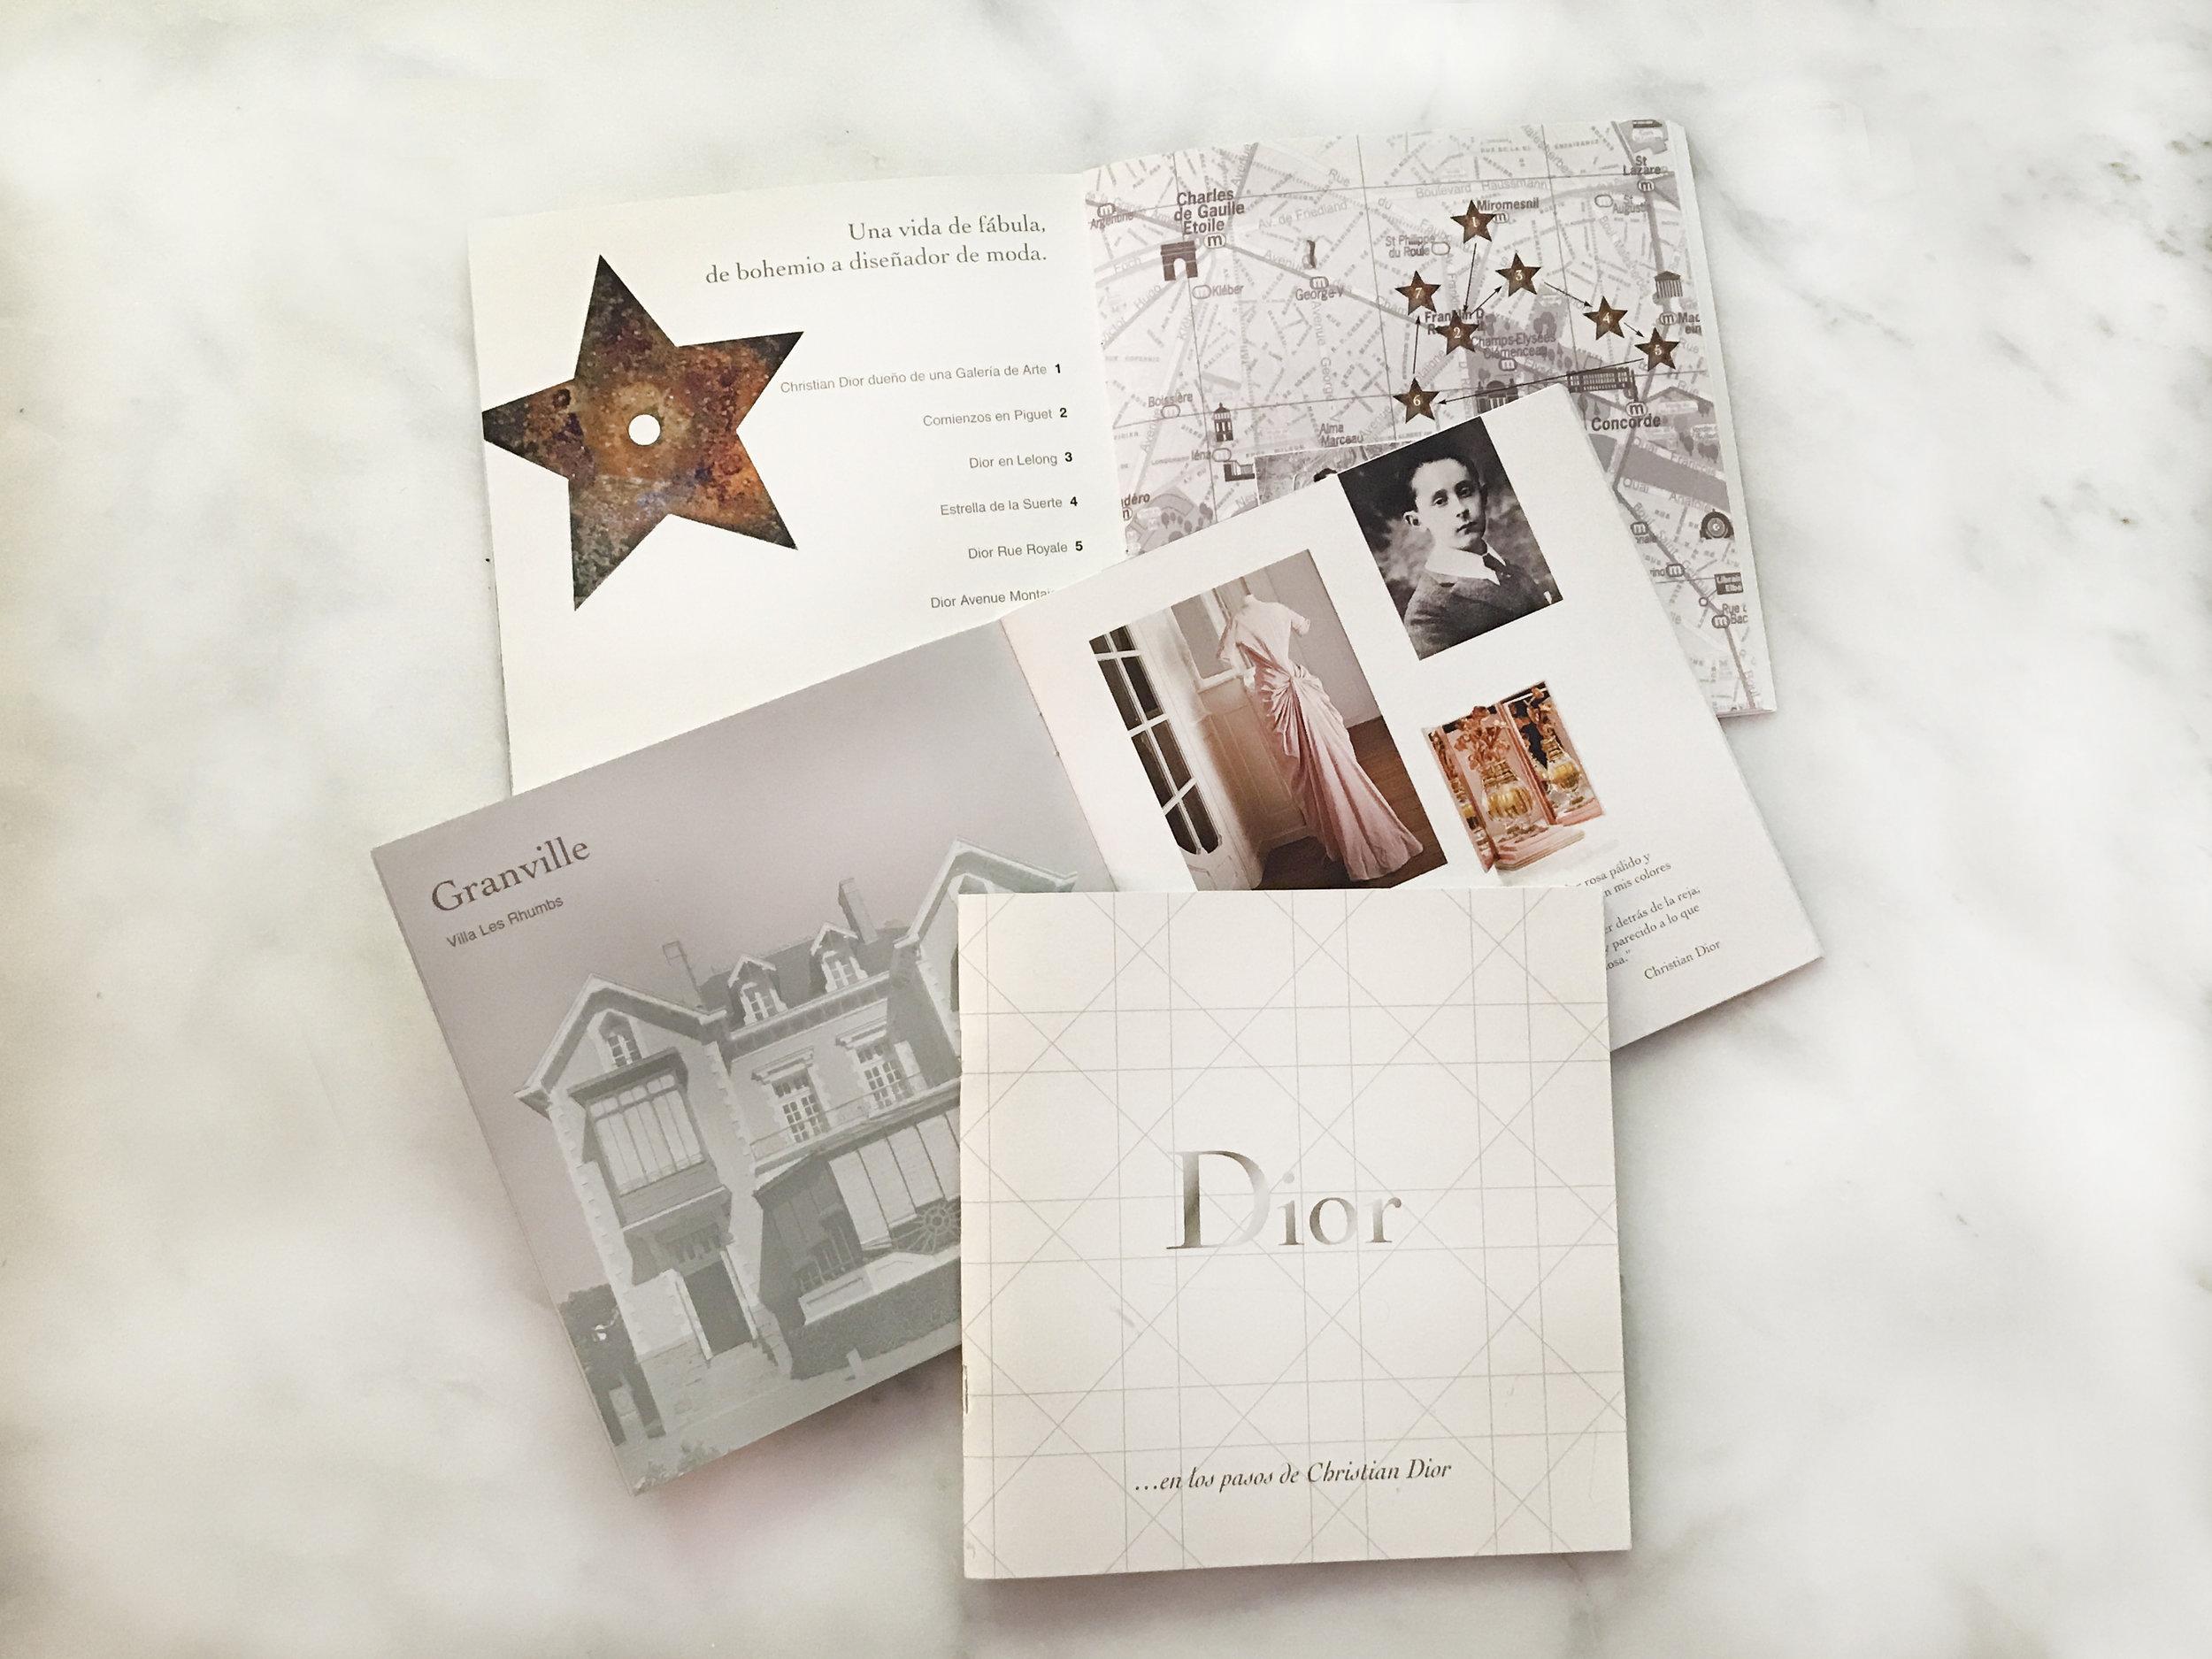 Dior2.jpg